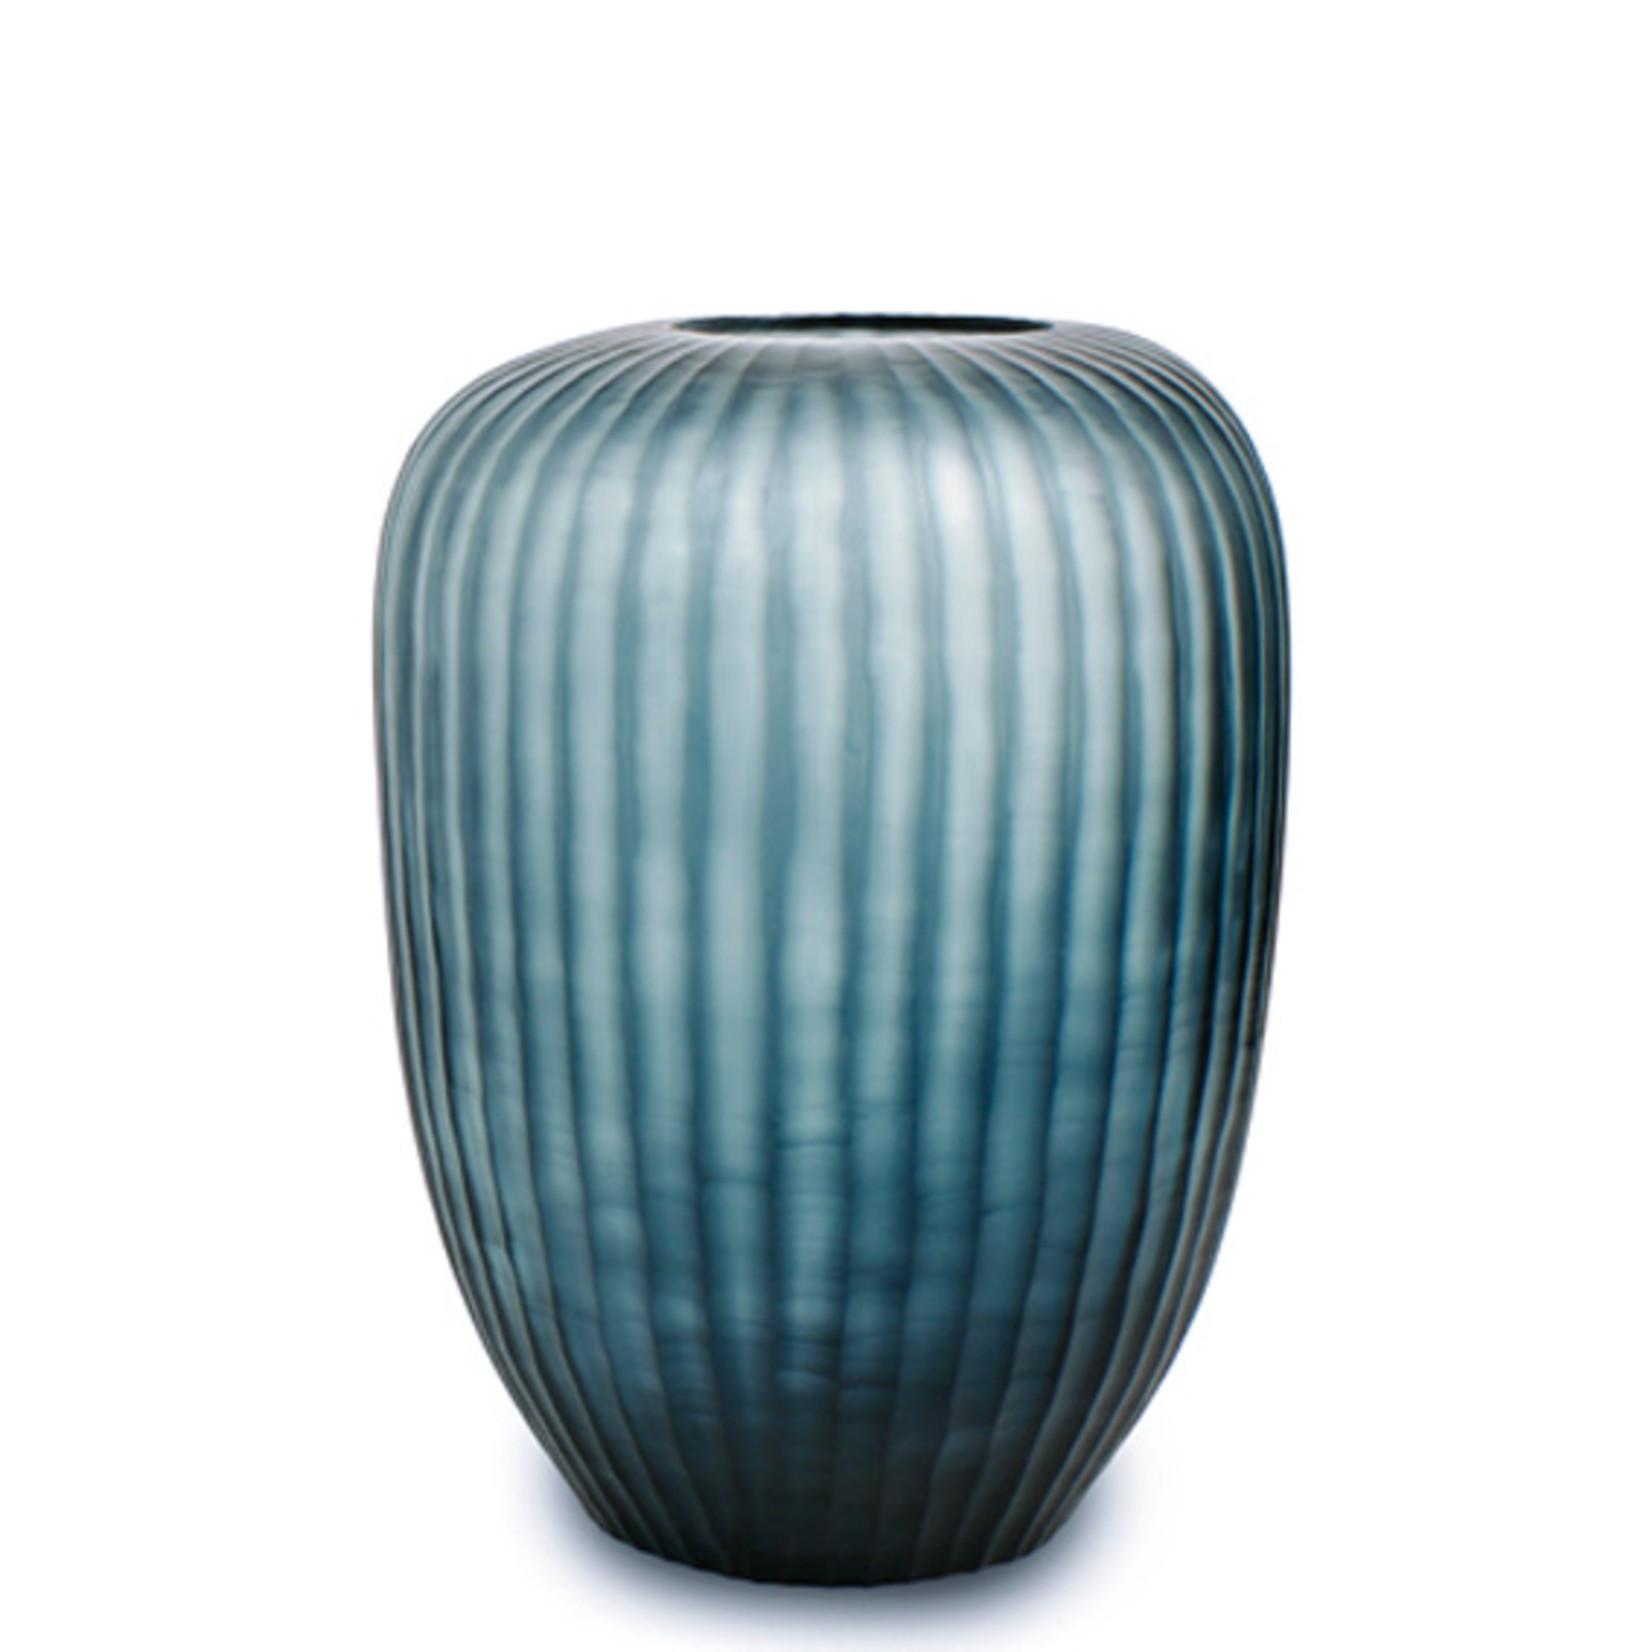 Guaxs Vase Gobi Tall   Ocean Blue / Indigo